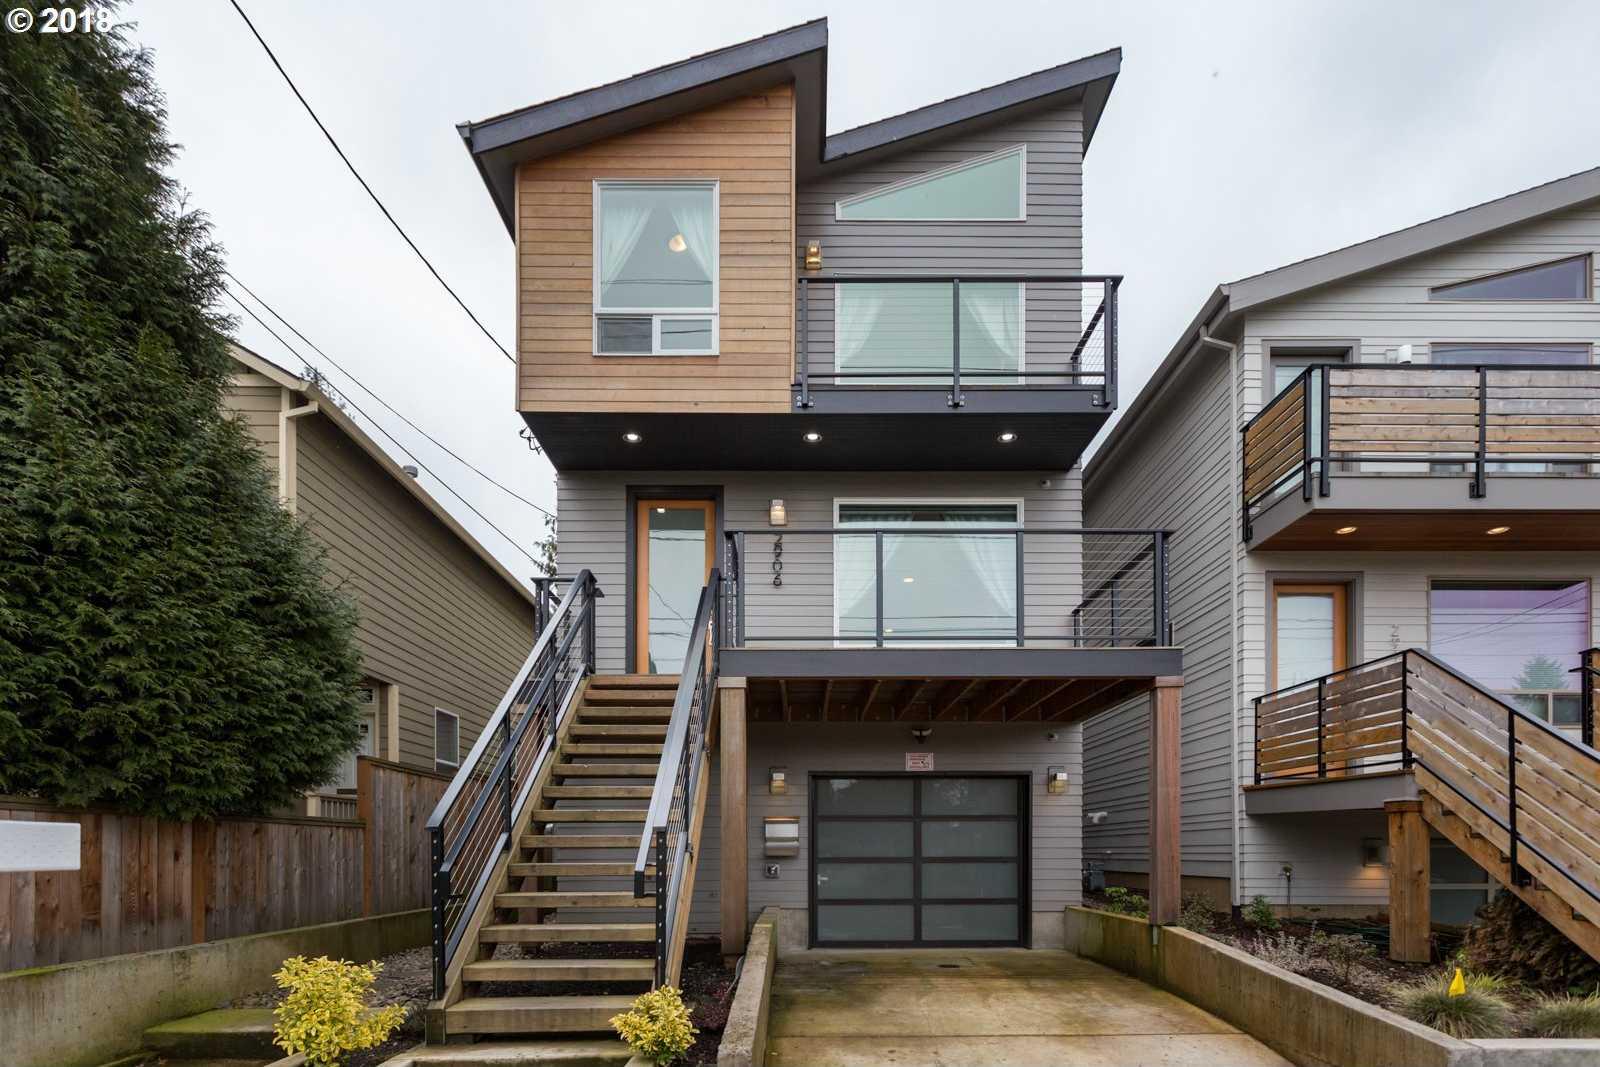 $699,900 - 4Br/4Ba -  for Sale in Kenton, Portland